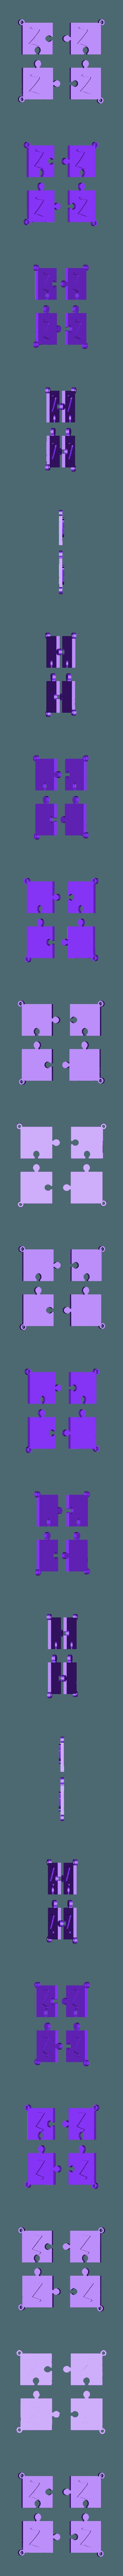 puzzle z.stl Download STL file puzzle key ring • 3D printing design, catf3d